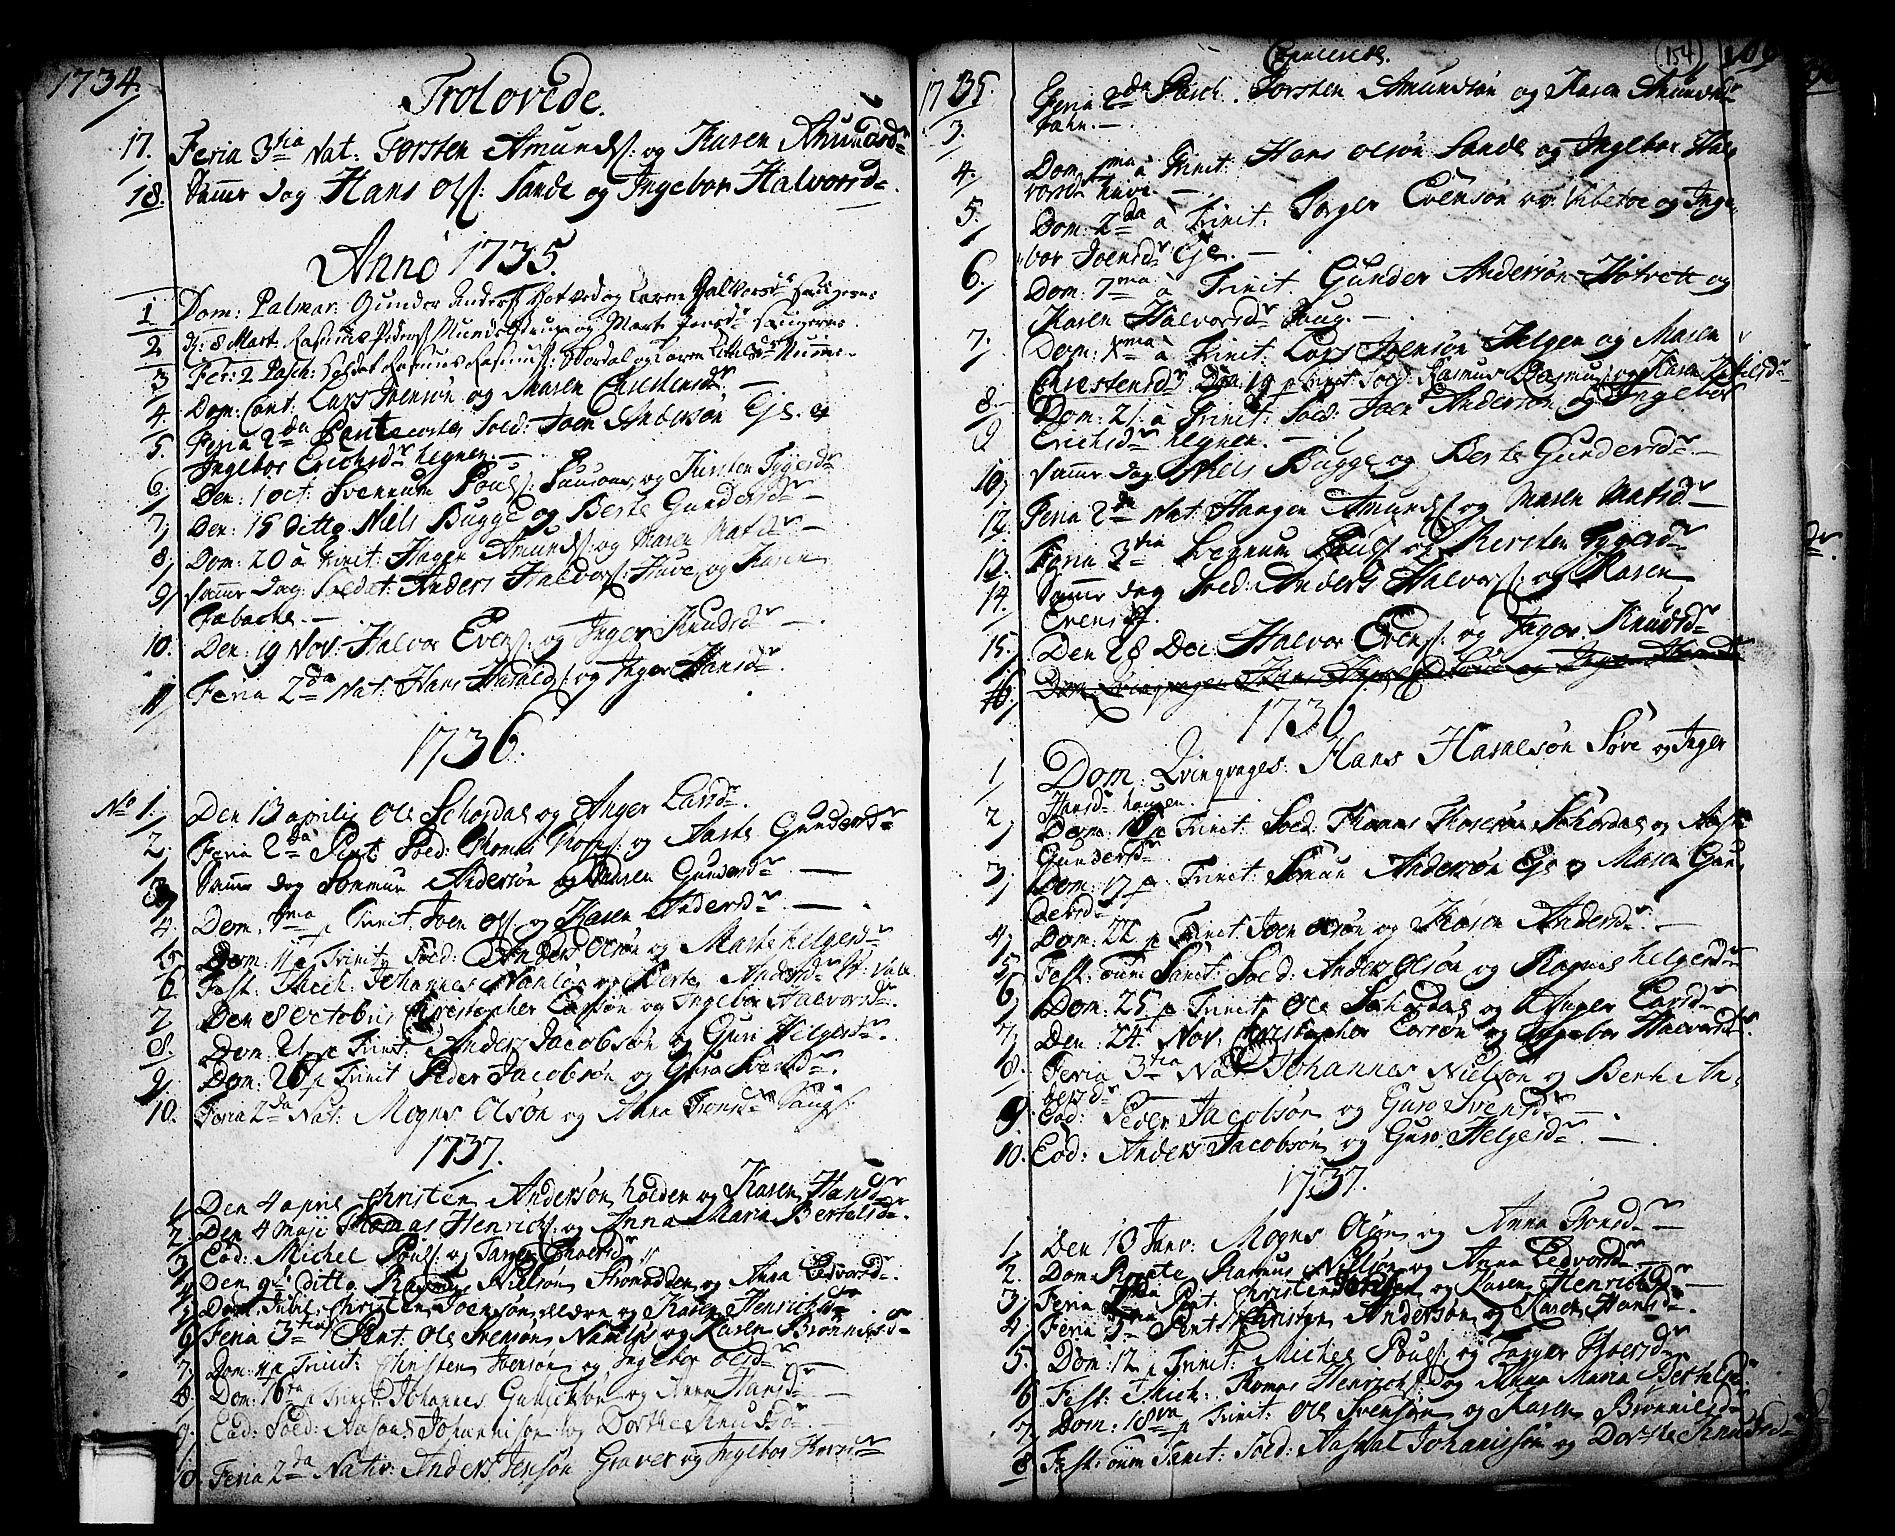 SAKO, Holla kirkebøker, F/Fa/L0001: Ministerialbok nr. 1, 1717-1779, s. 154